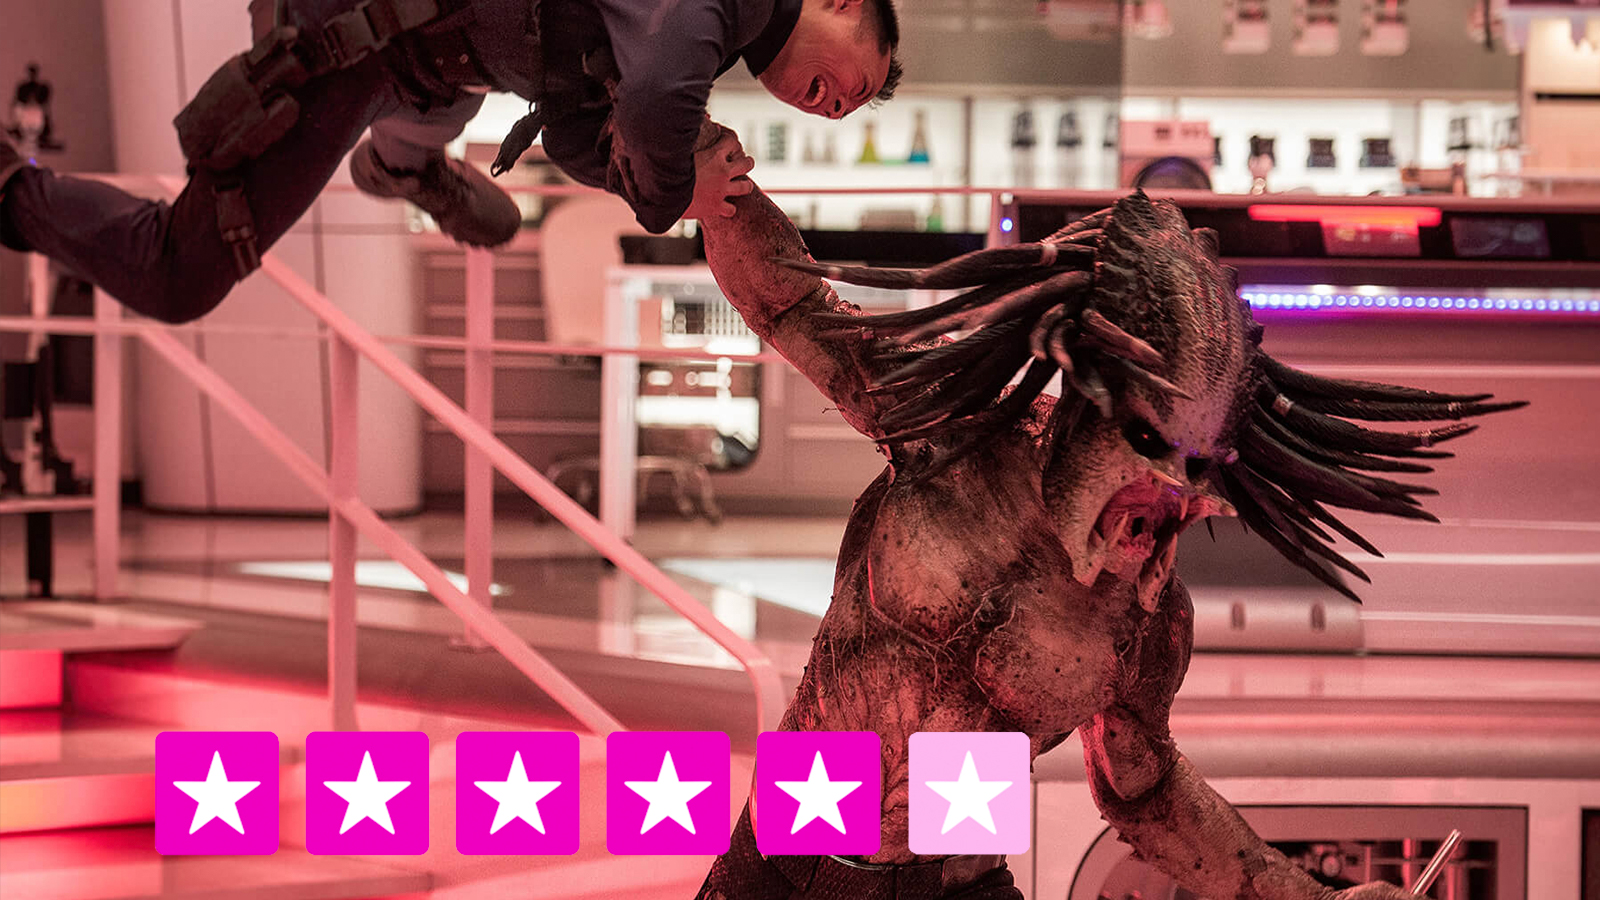 predator_artikelbillede_stjerner.jpg